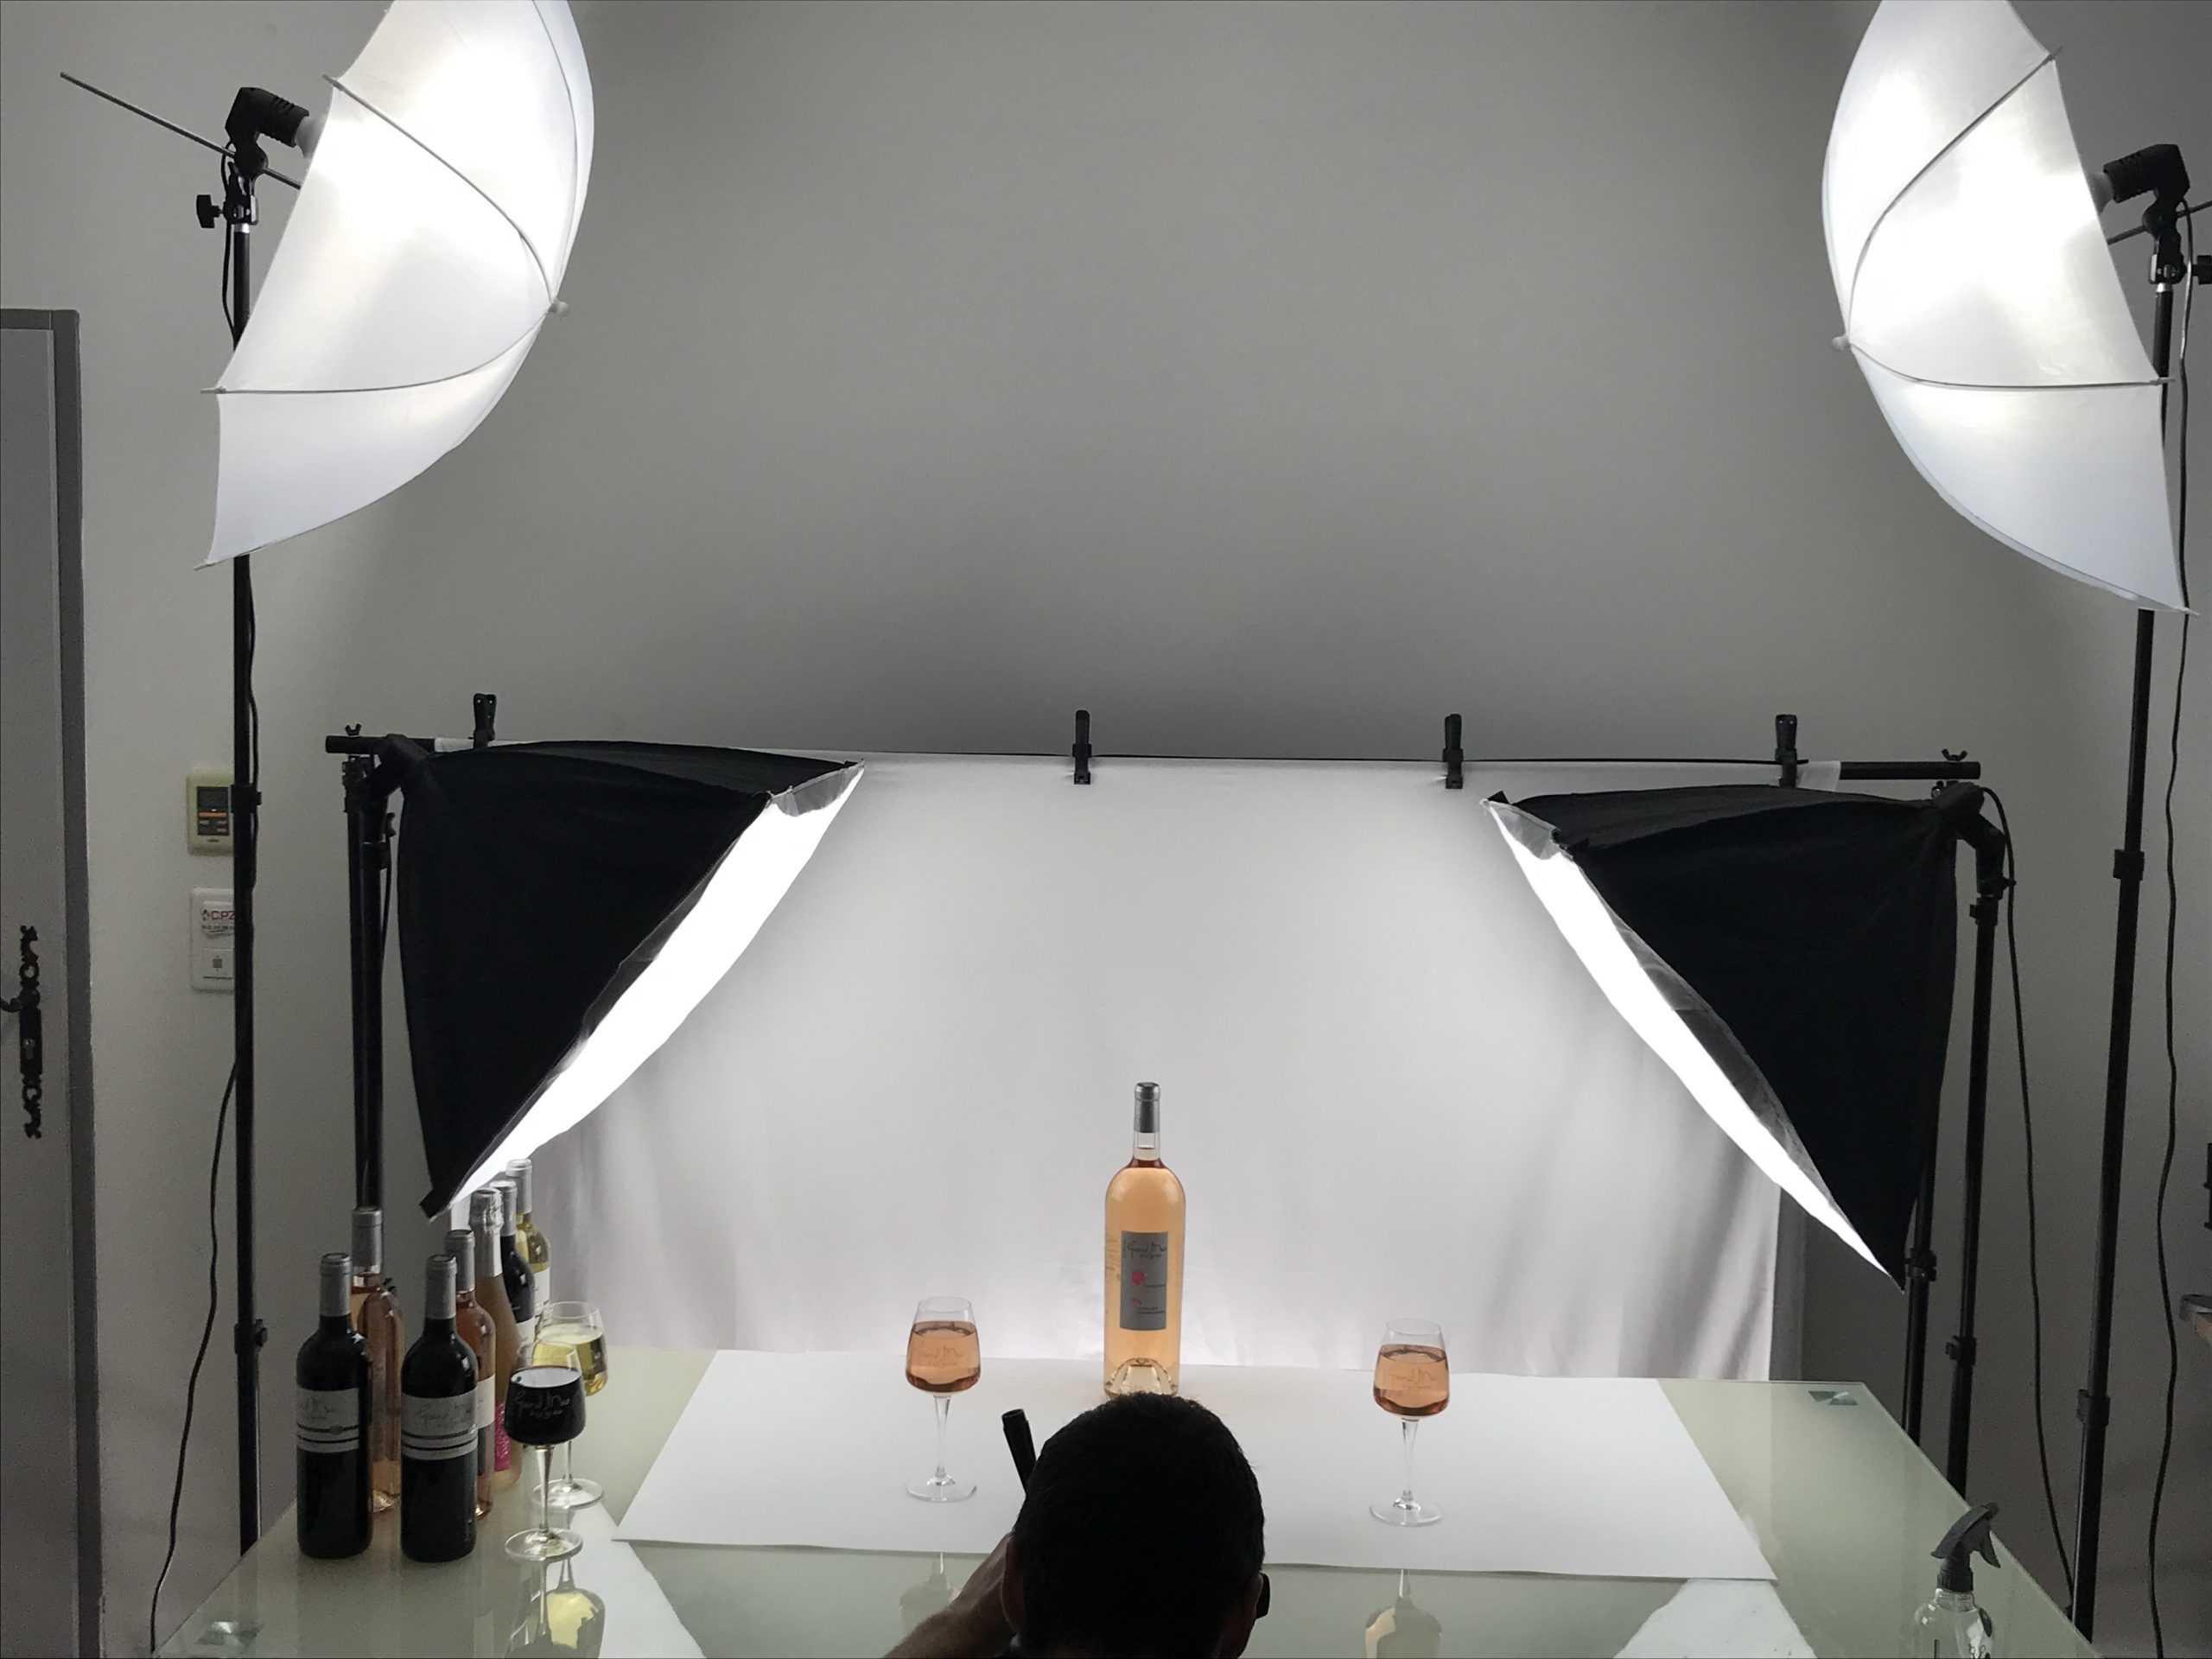 Séance studio photo